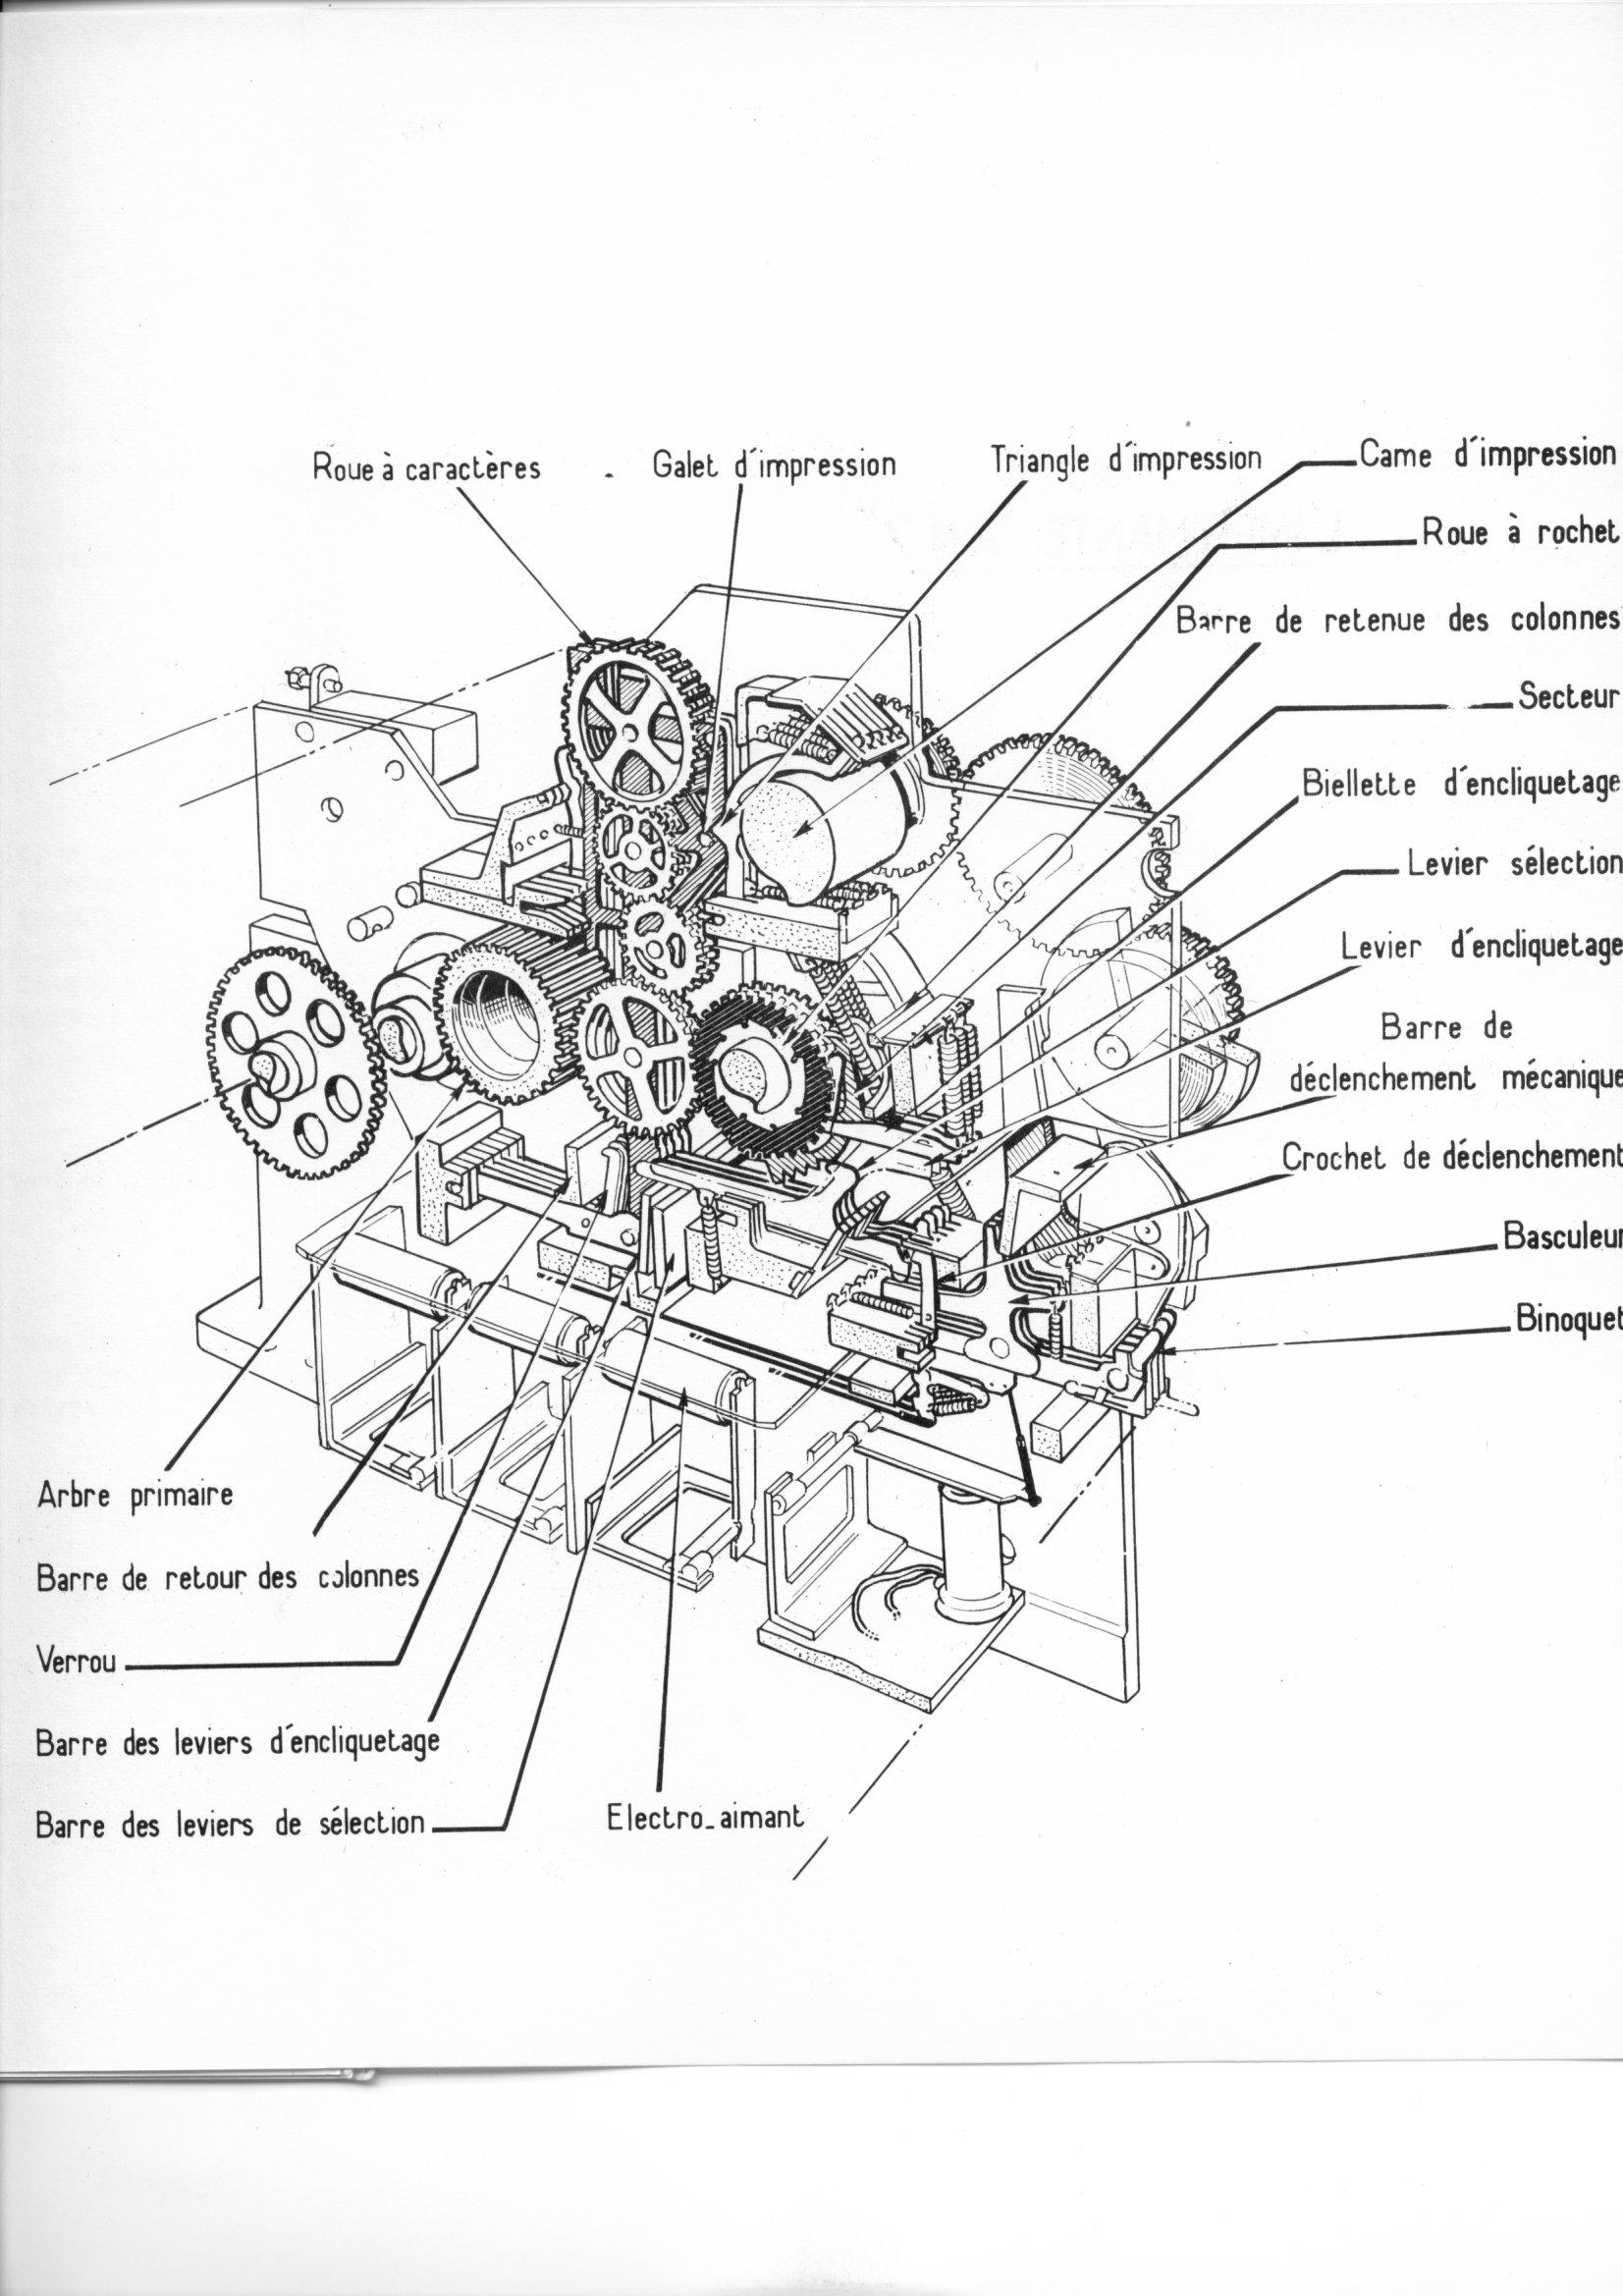 bedradings schema for e 150 2003